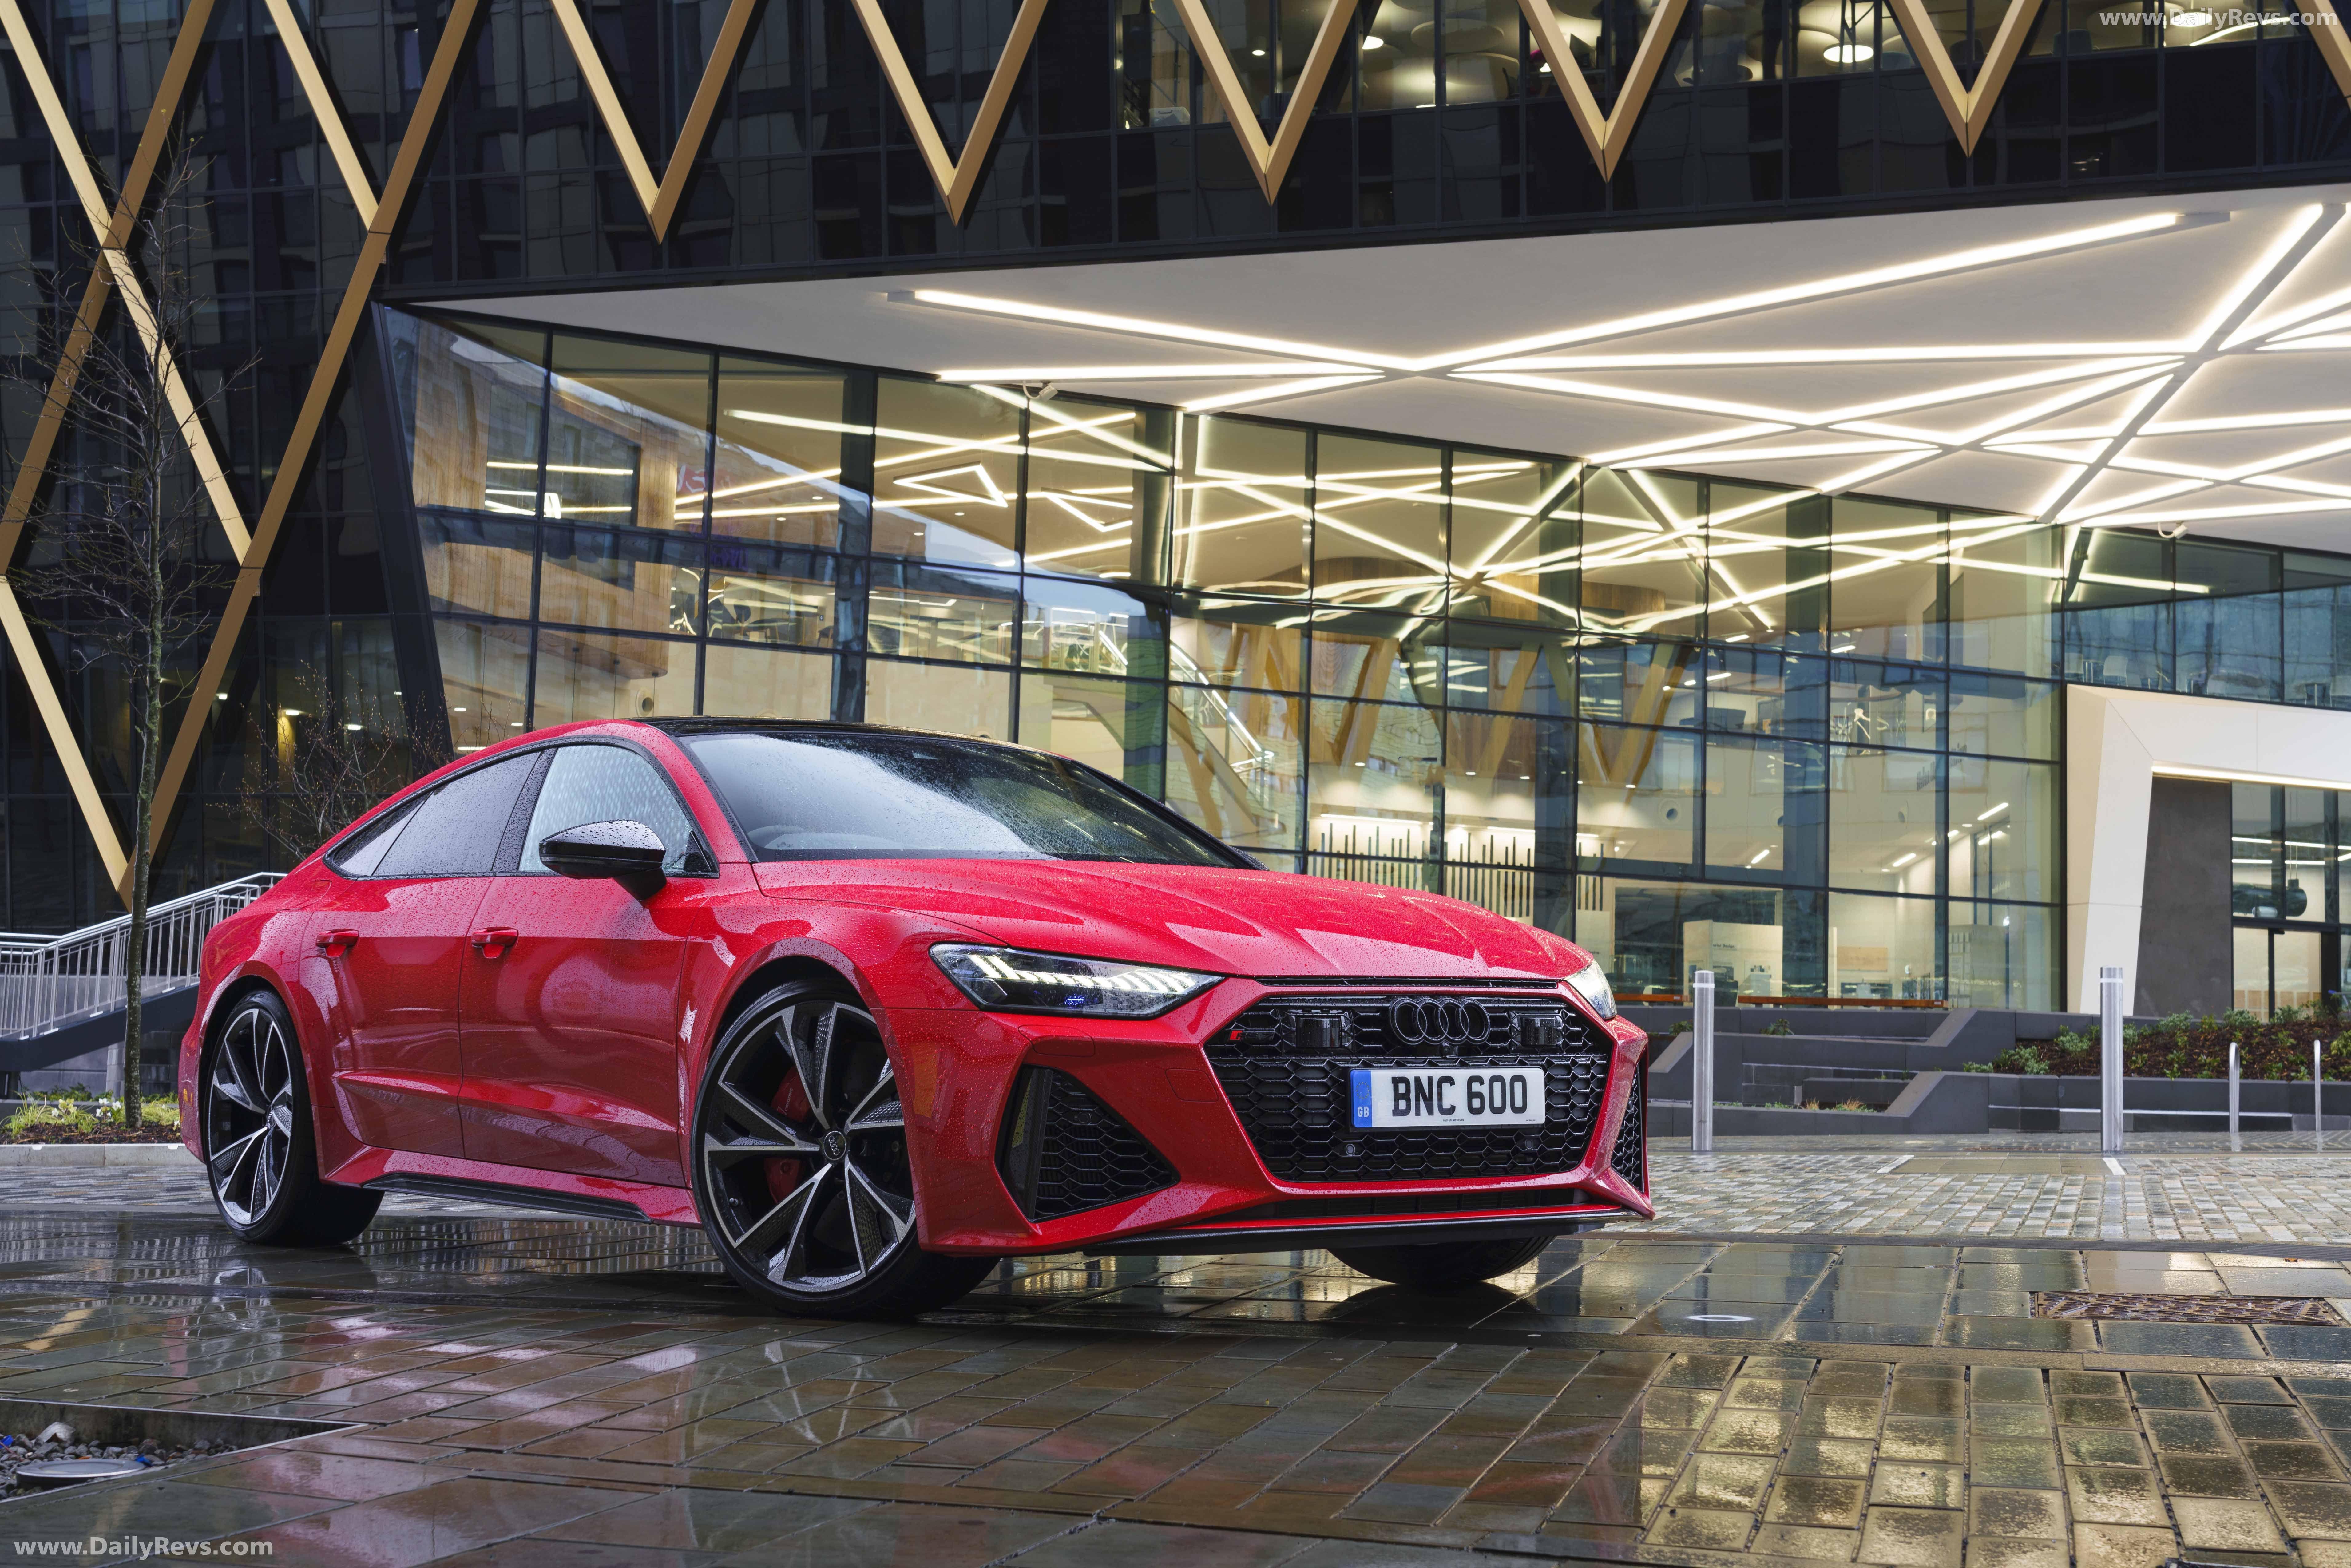 2020 Audi Rs 7 Sportback Uk Hd Pictures Videos Specs Information Em 2020 Carros